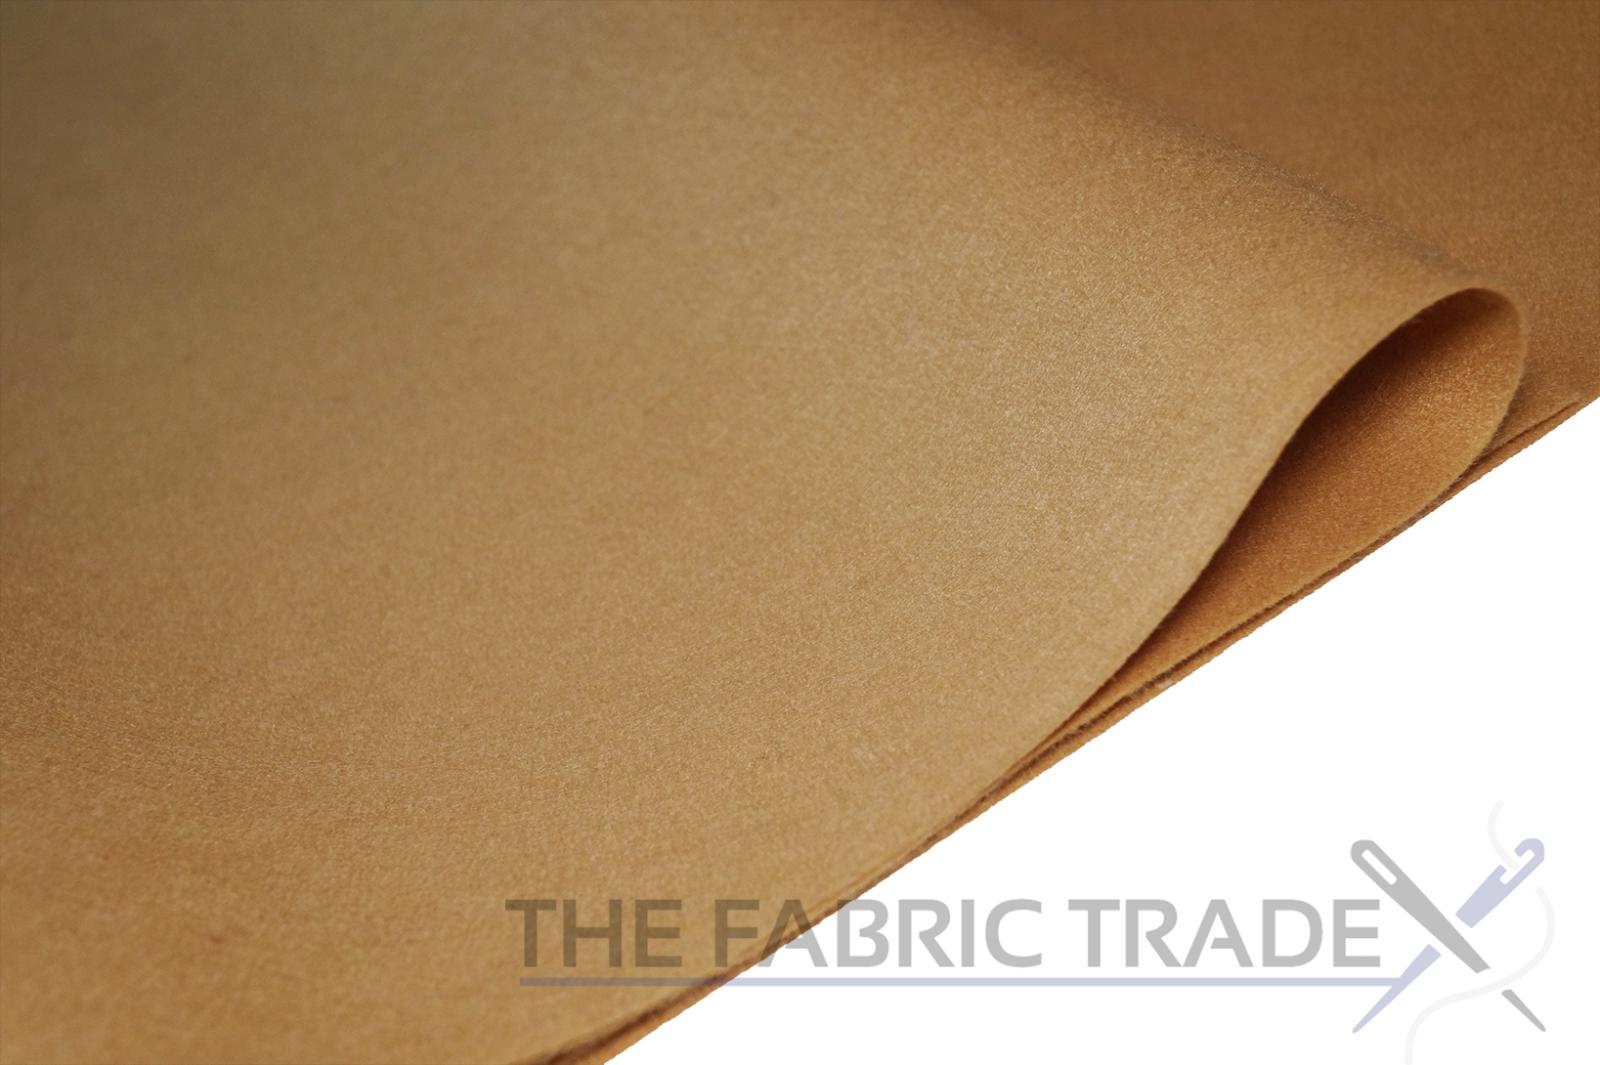 Acrylic Felt Baize Craft//Poker Fabric Material B.S DARK BROWN